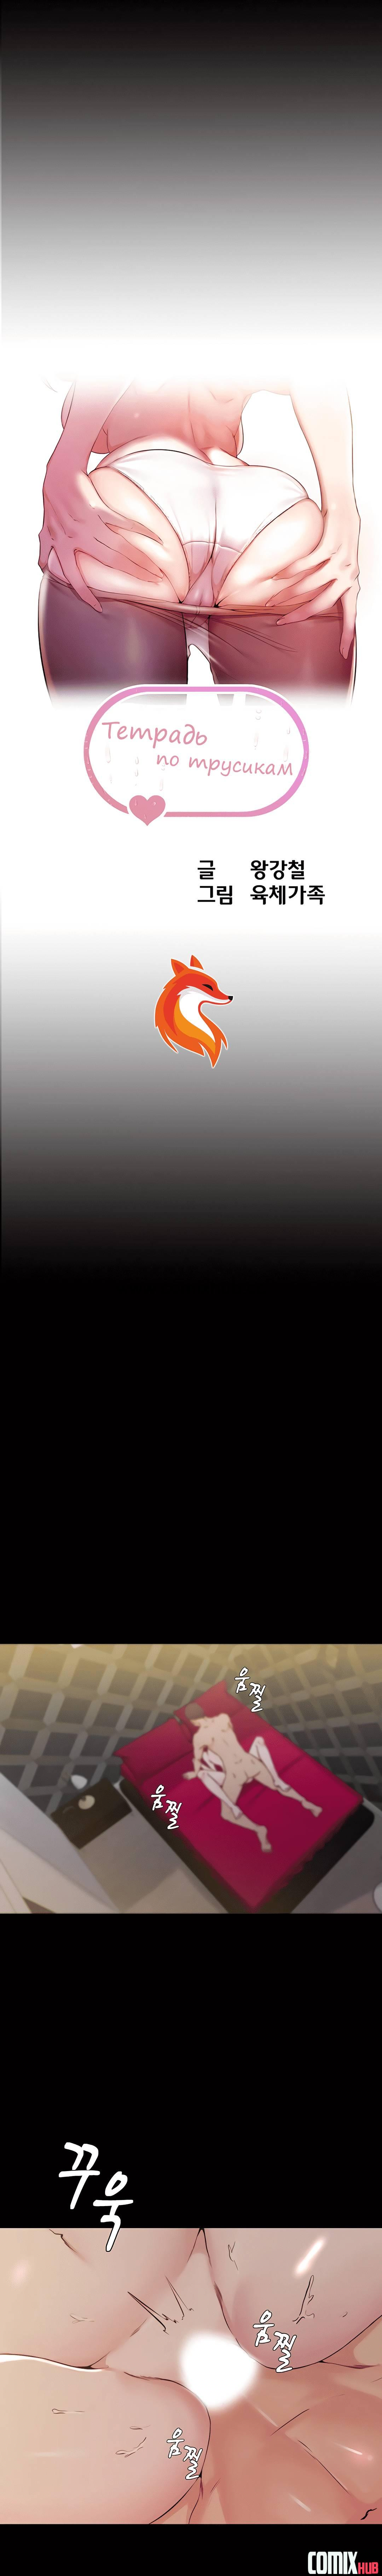 Манхва Тетрадь по трусикам, часть 32 Хентай манга, манхва, Большая грудь, Измена, Мастурбация, Супер-герои